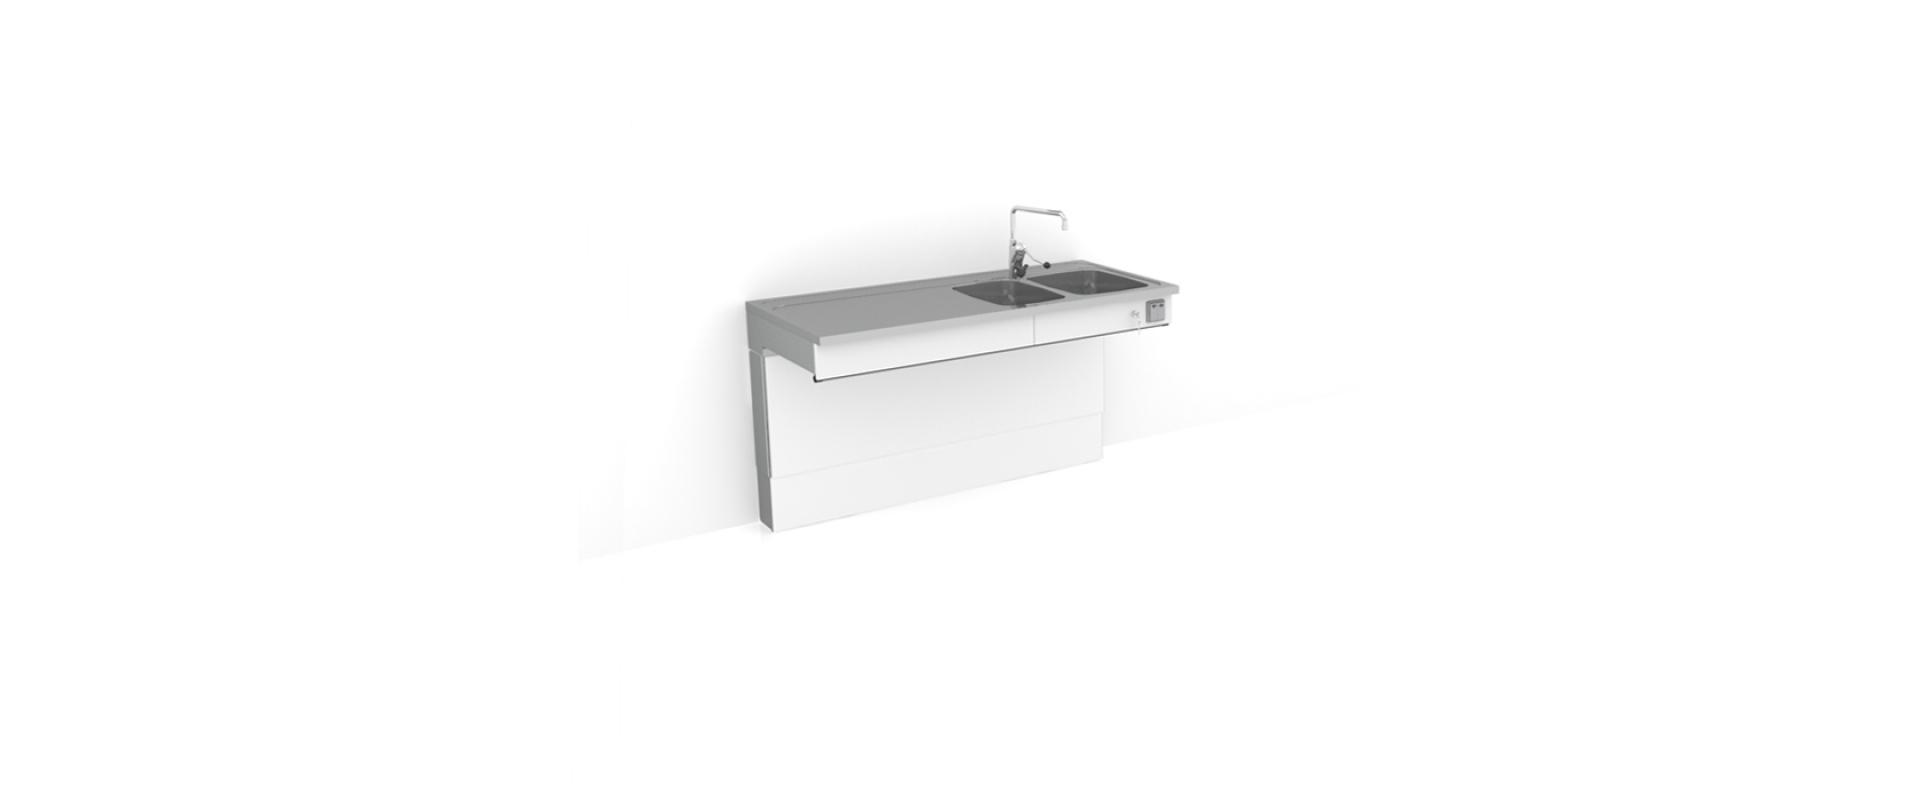 <b>Height adjustable sink 6300-ESH</b>